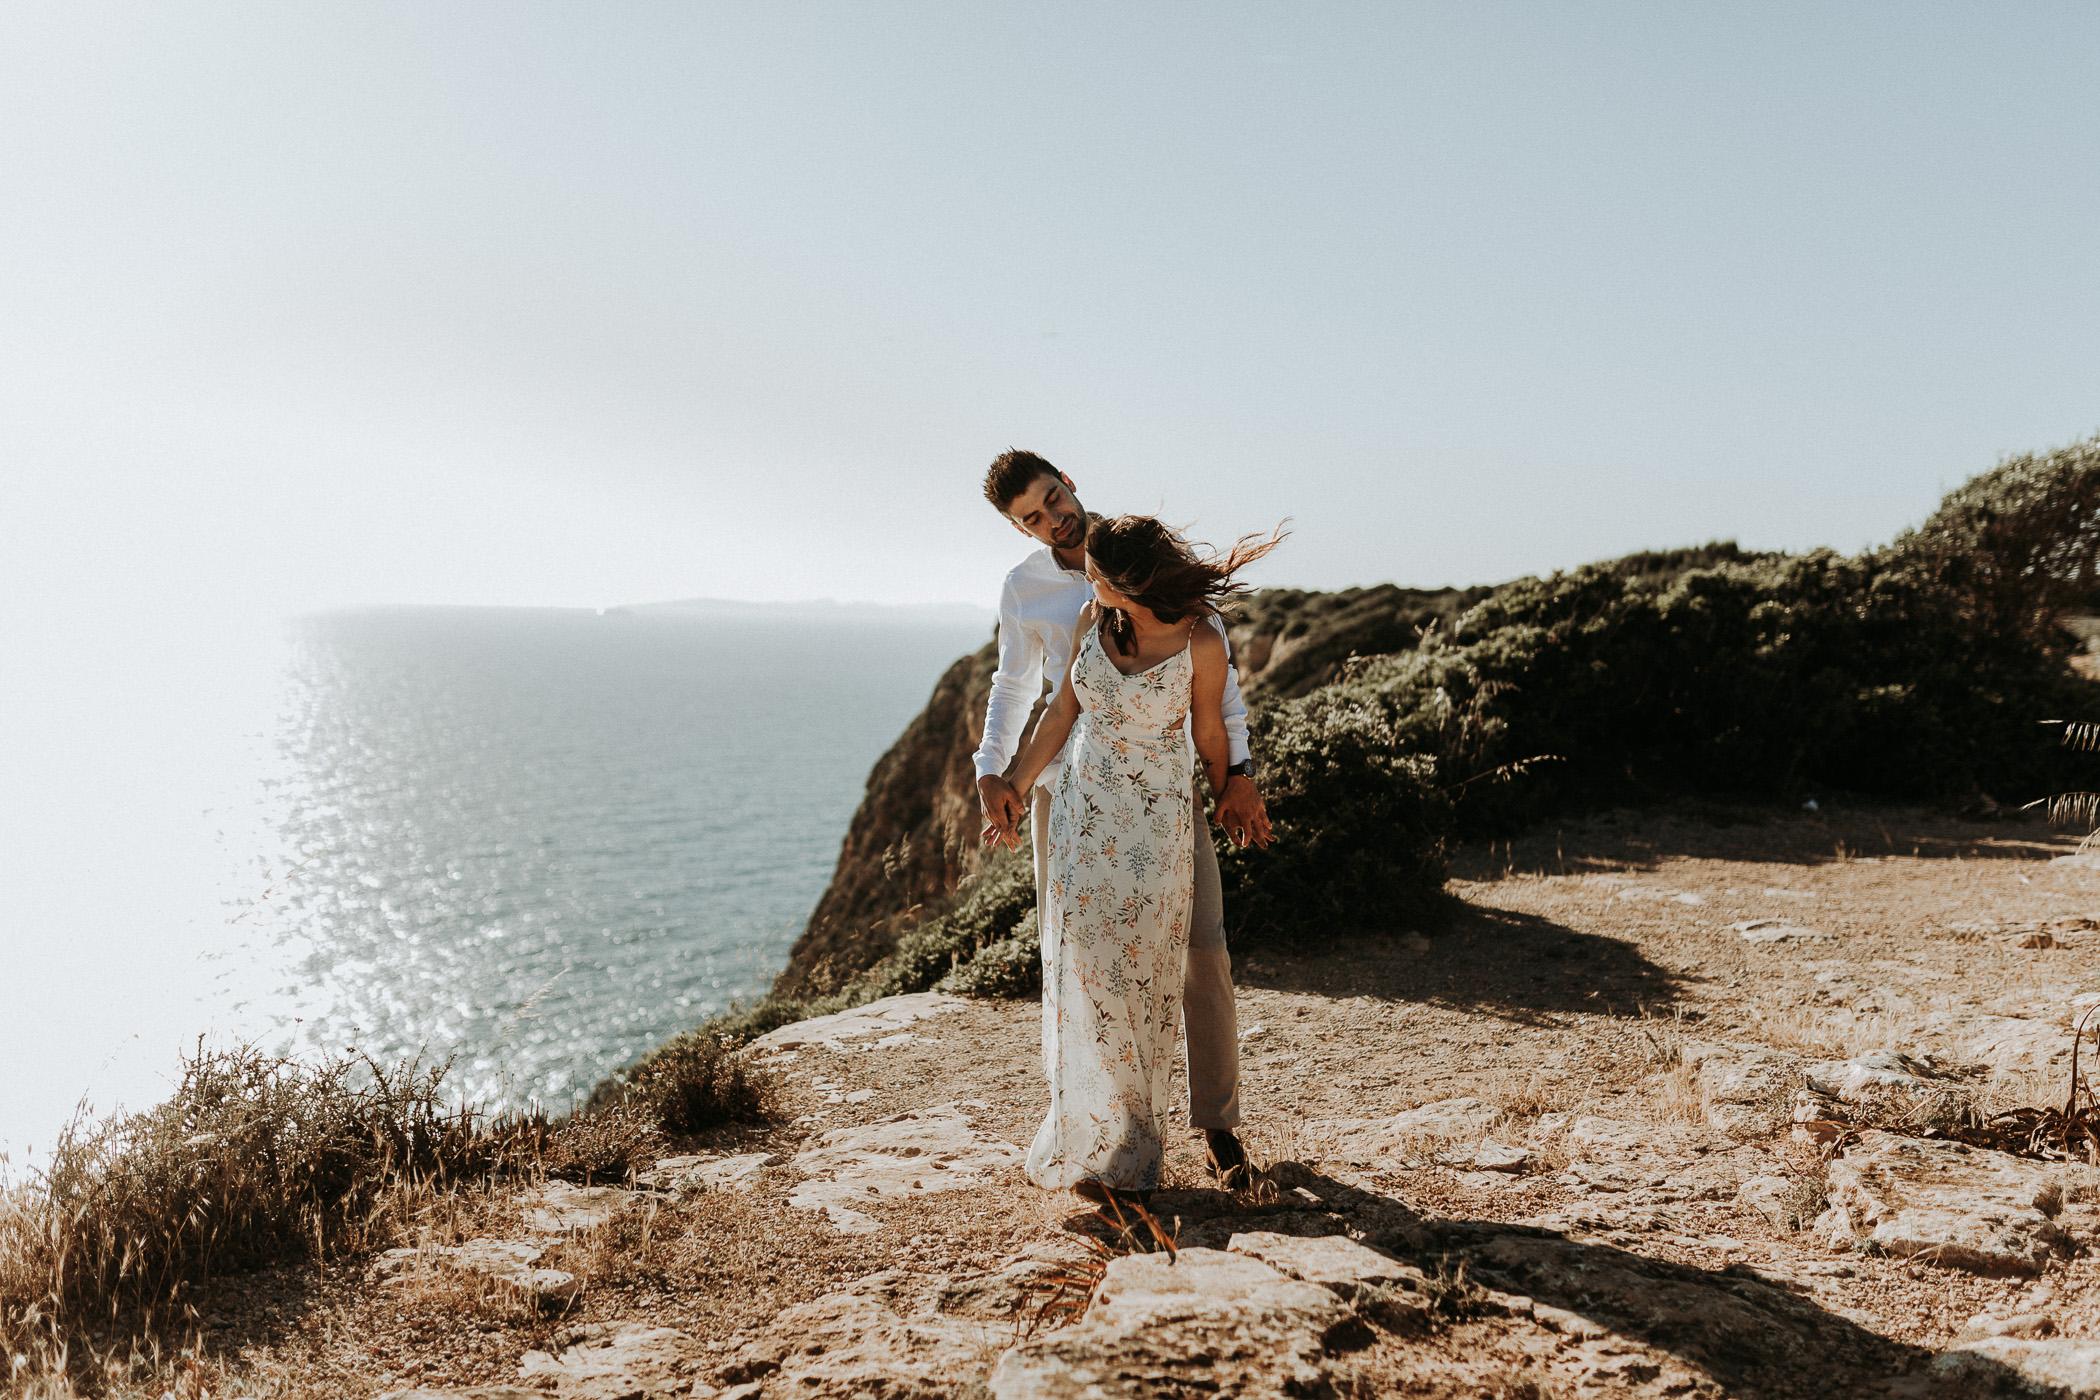 DanielaMarquardtPhotography_wedding_elopement_mallorca_spain_calapi_palma_lauraandtoni_97